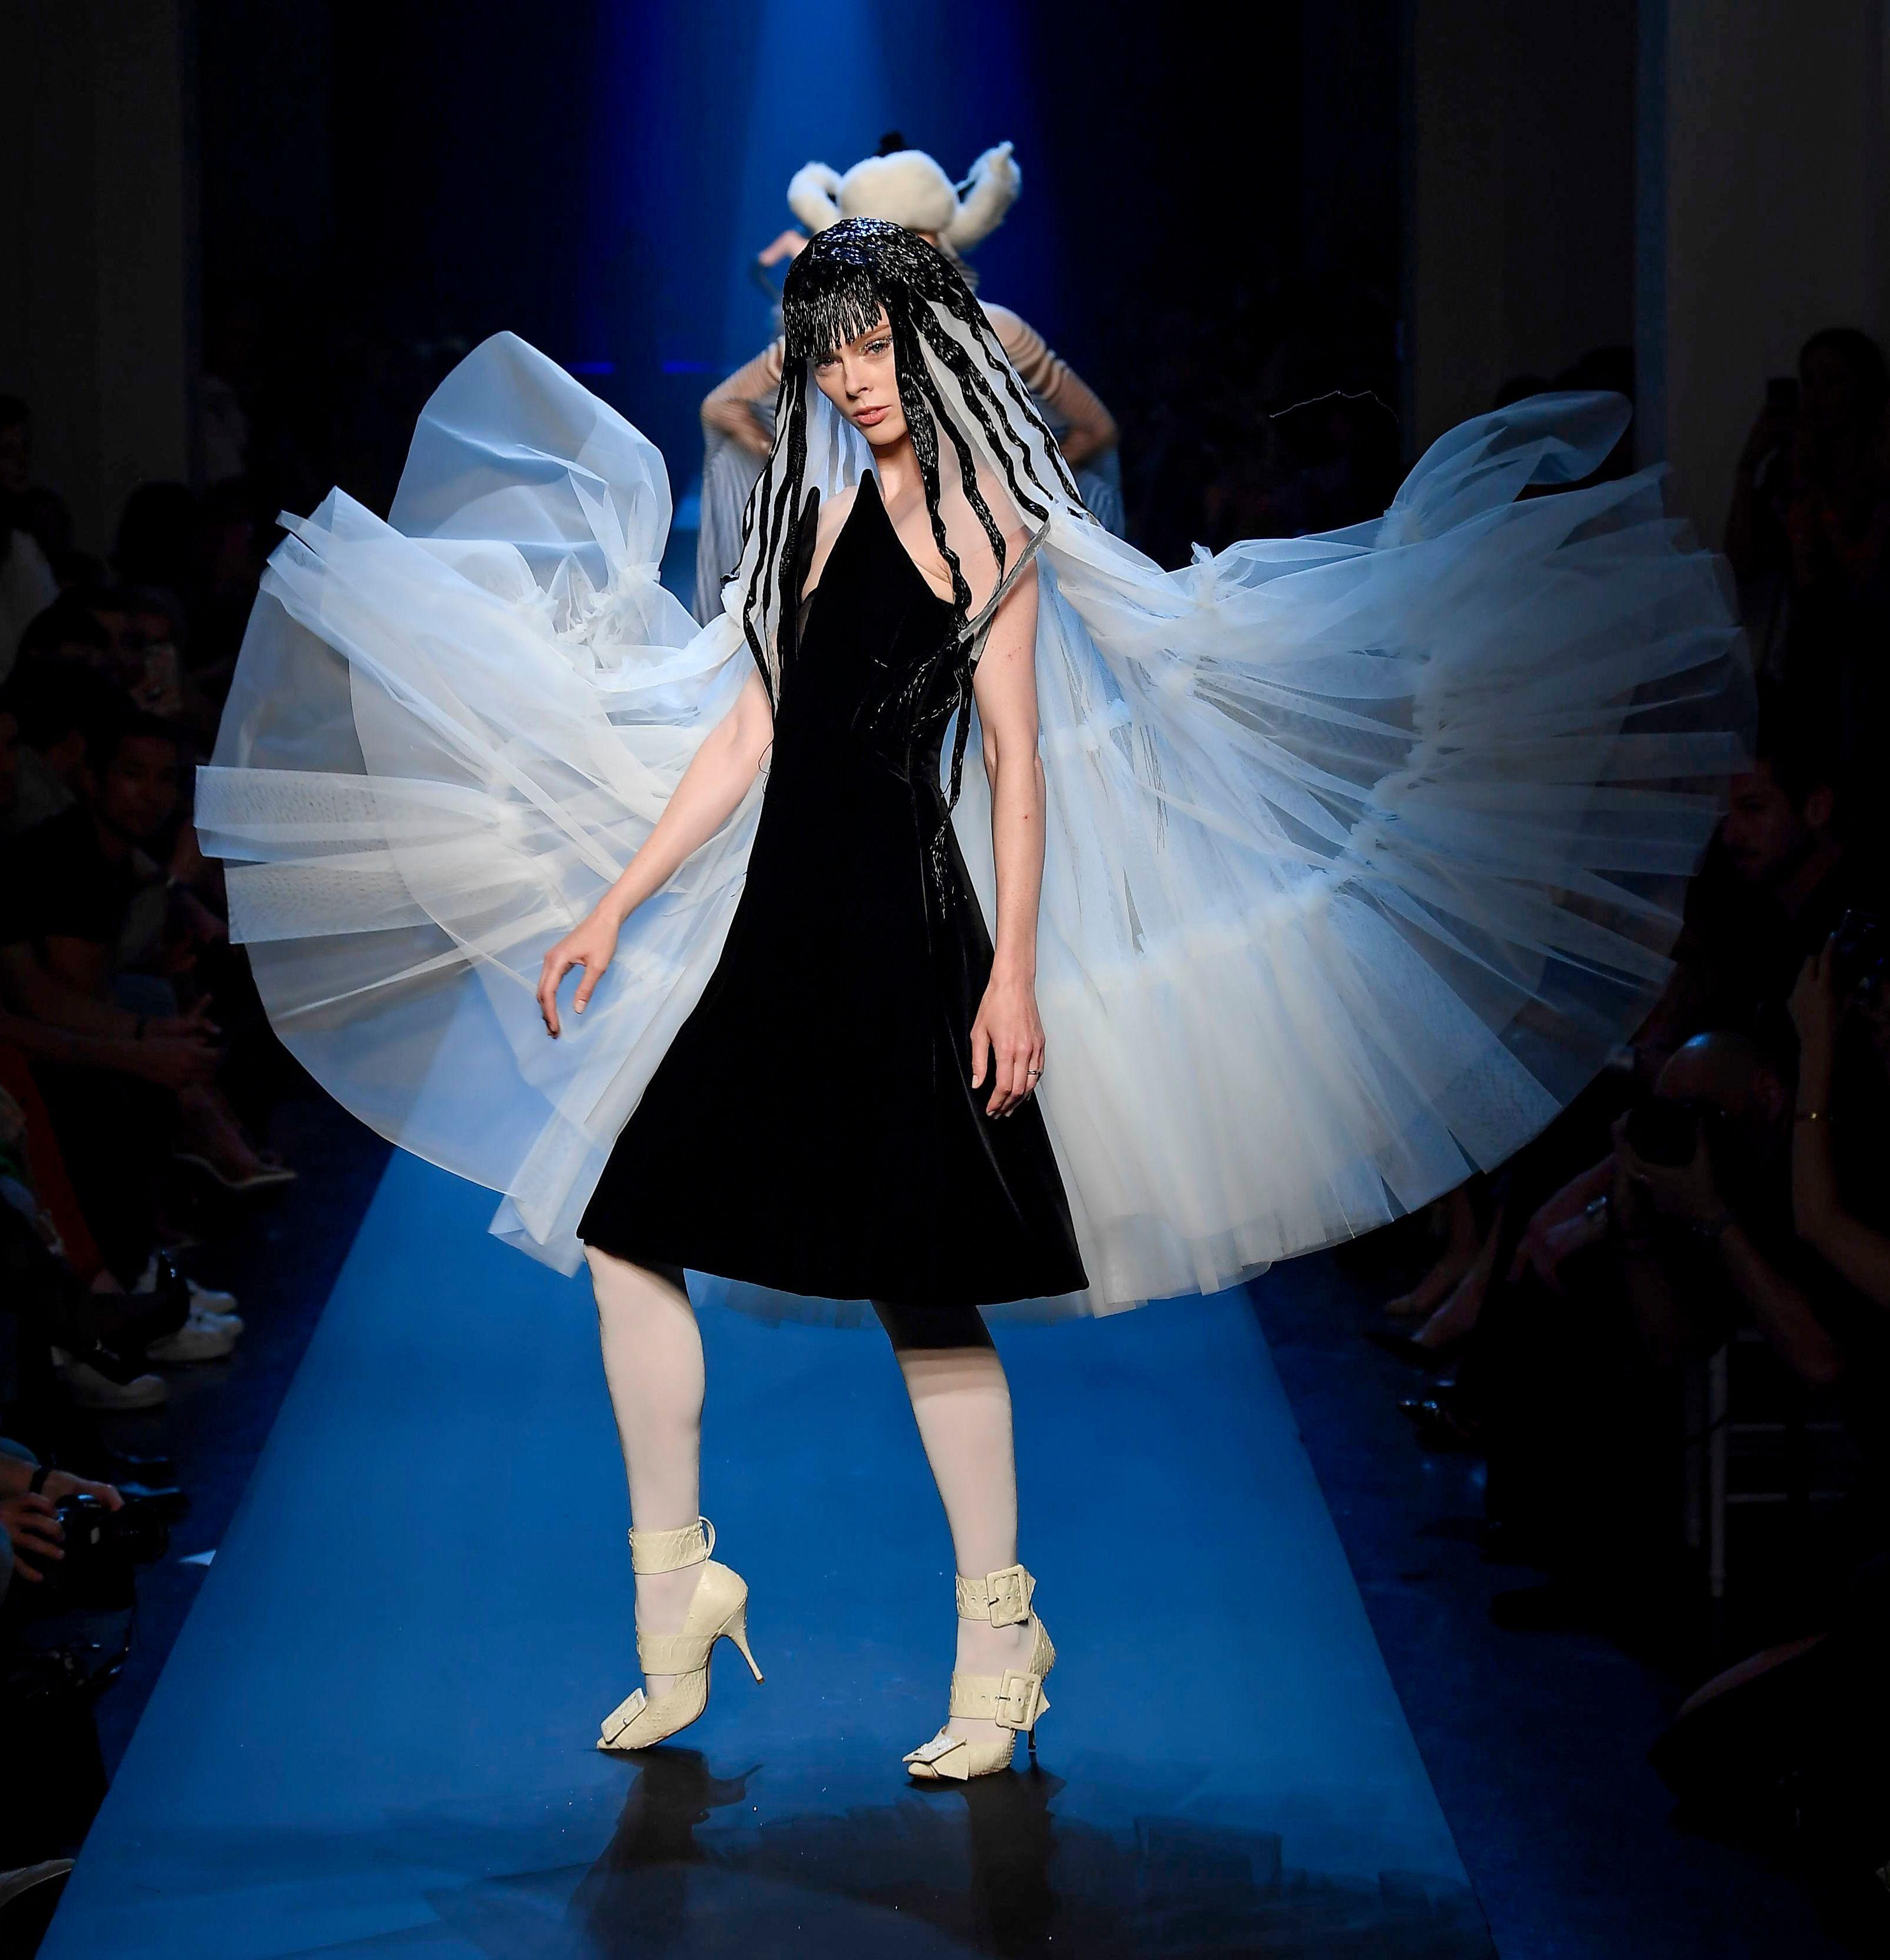 Coco Rocha on the catwalkJean Paul Gaultier show, Runway, Fall Winter 2019, Haute Couture Fashion Week, Paris, France - 03 Jul 2019